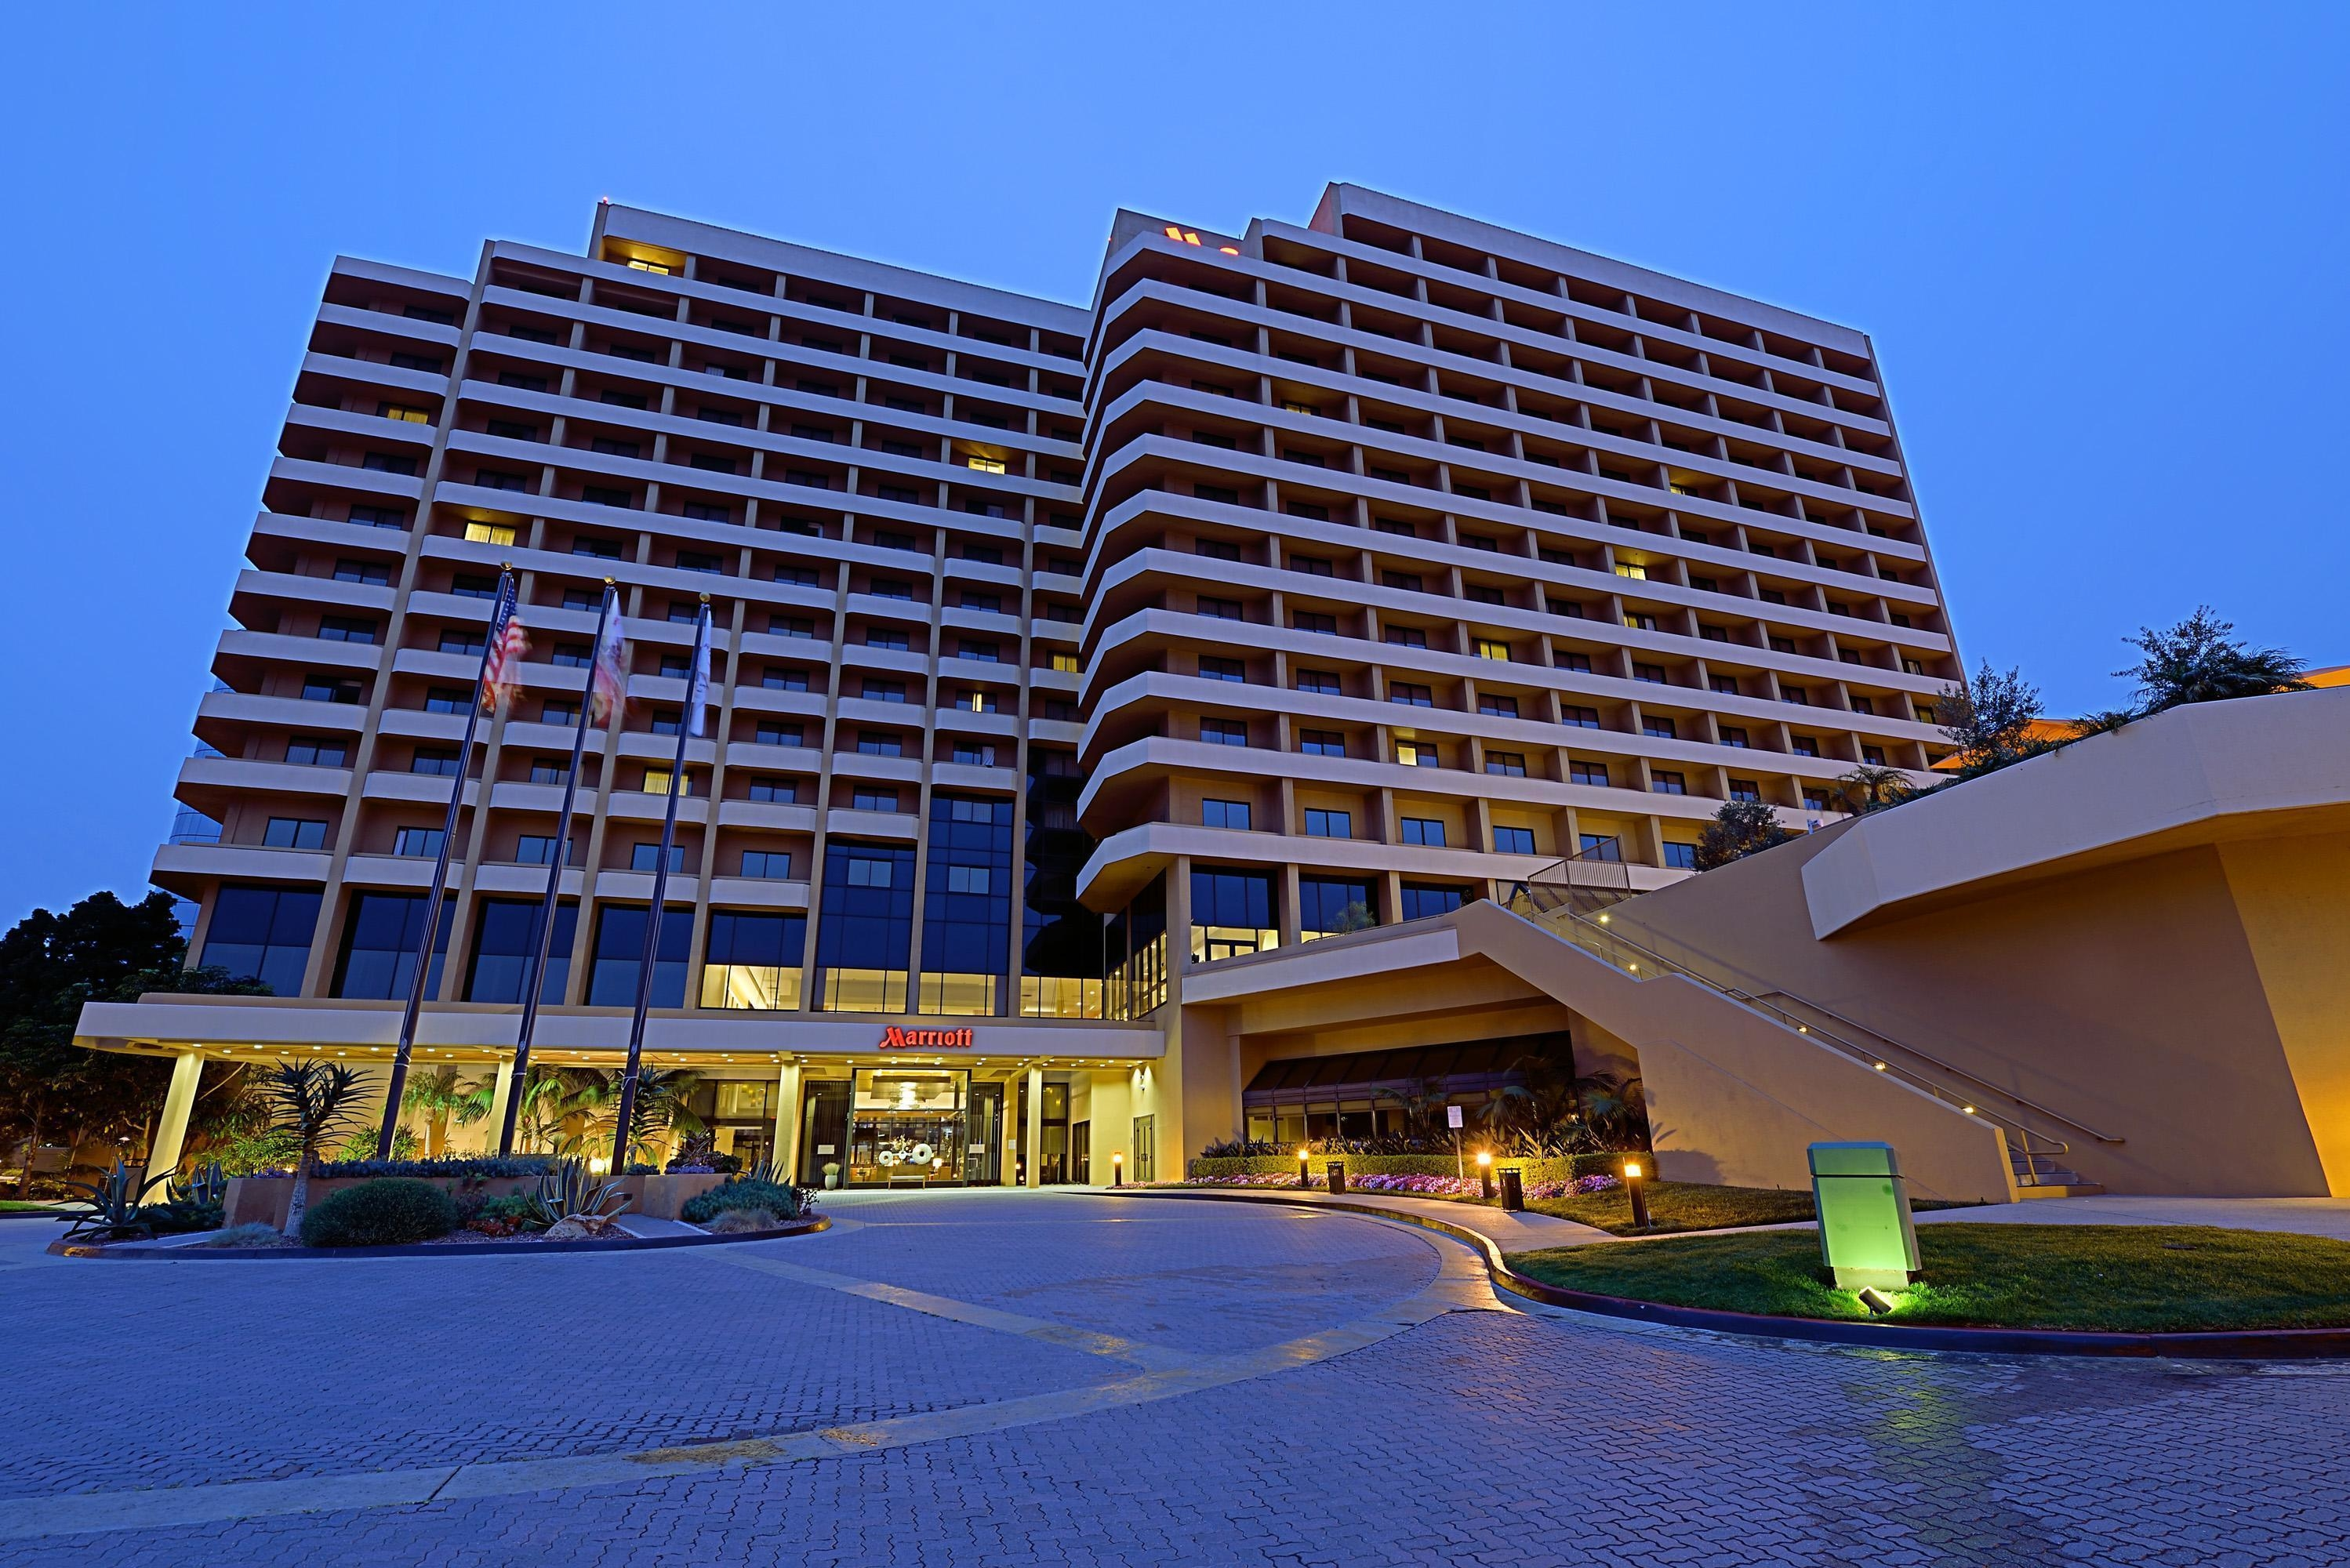 San Diego Marriott La Jolla image 0